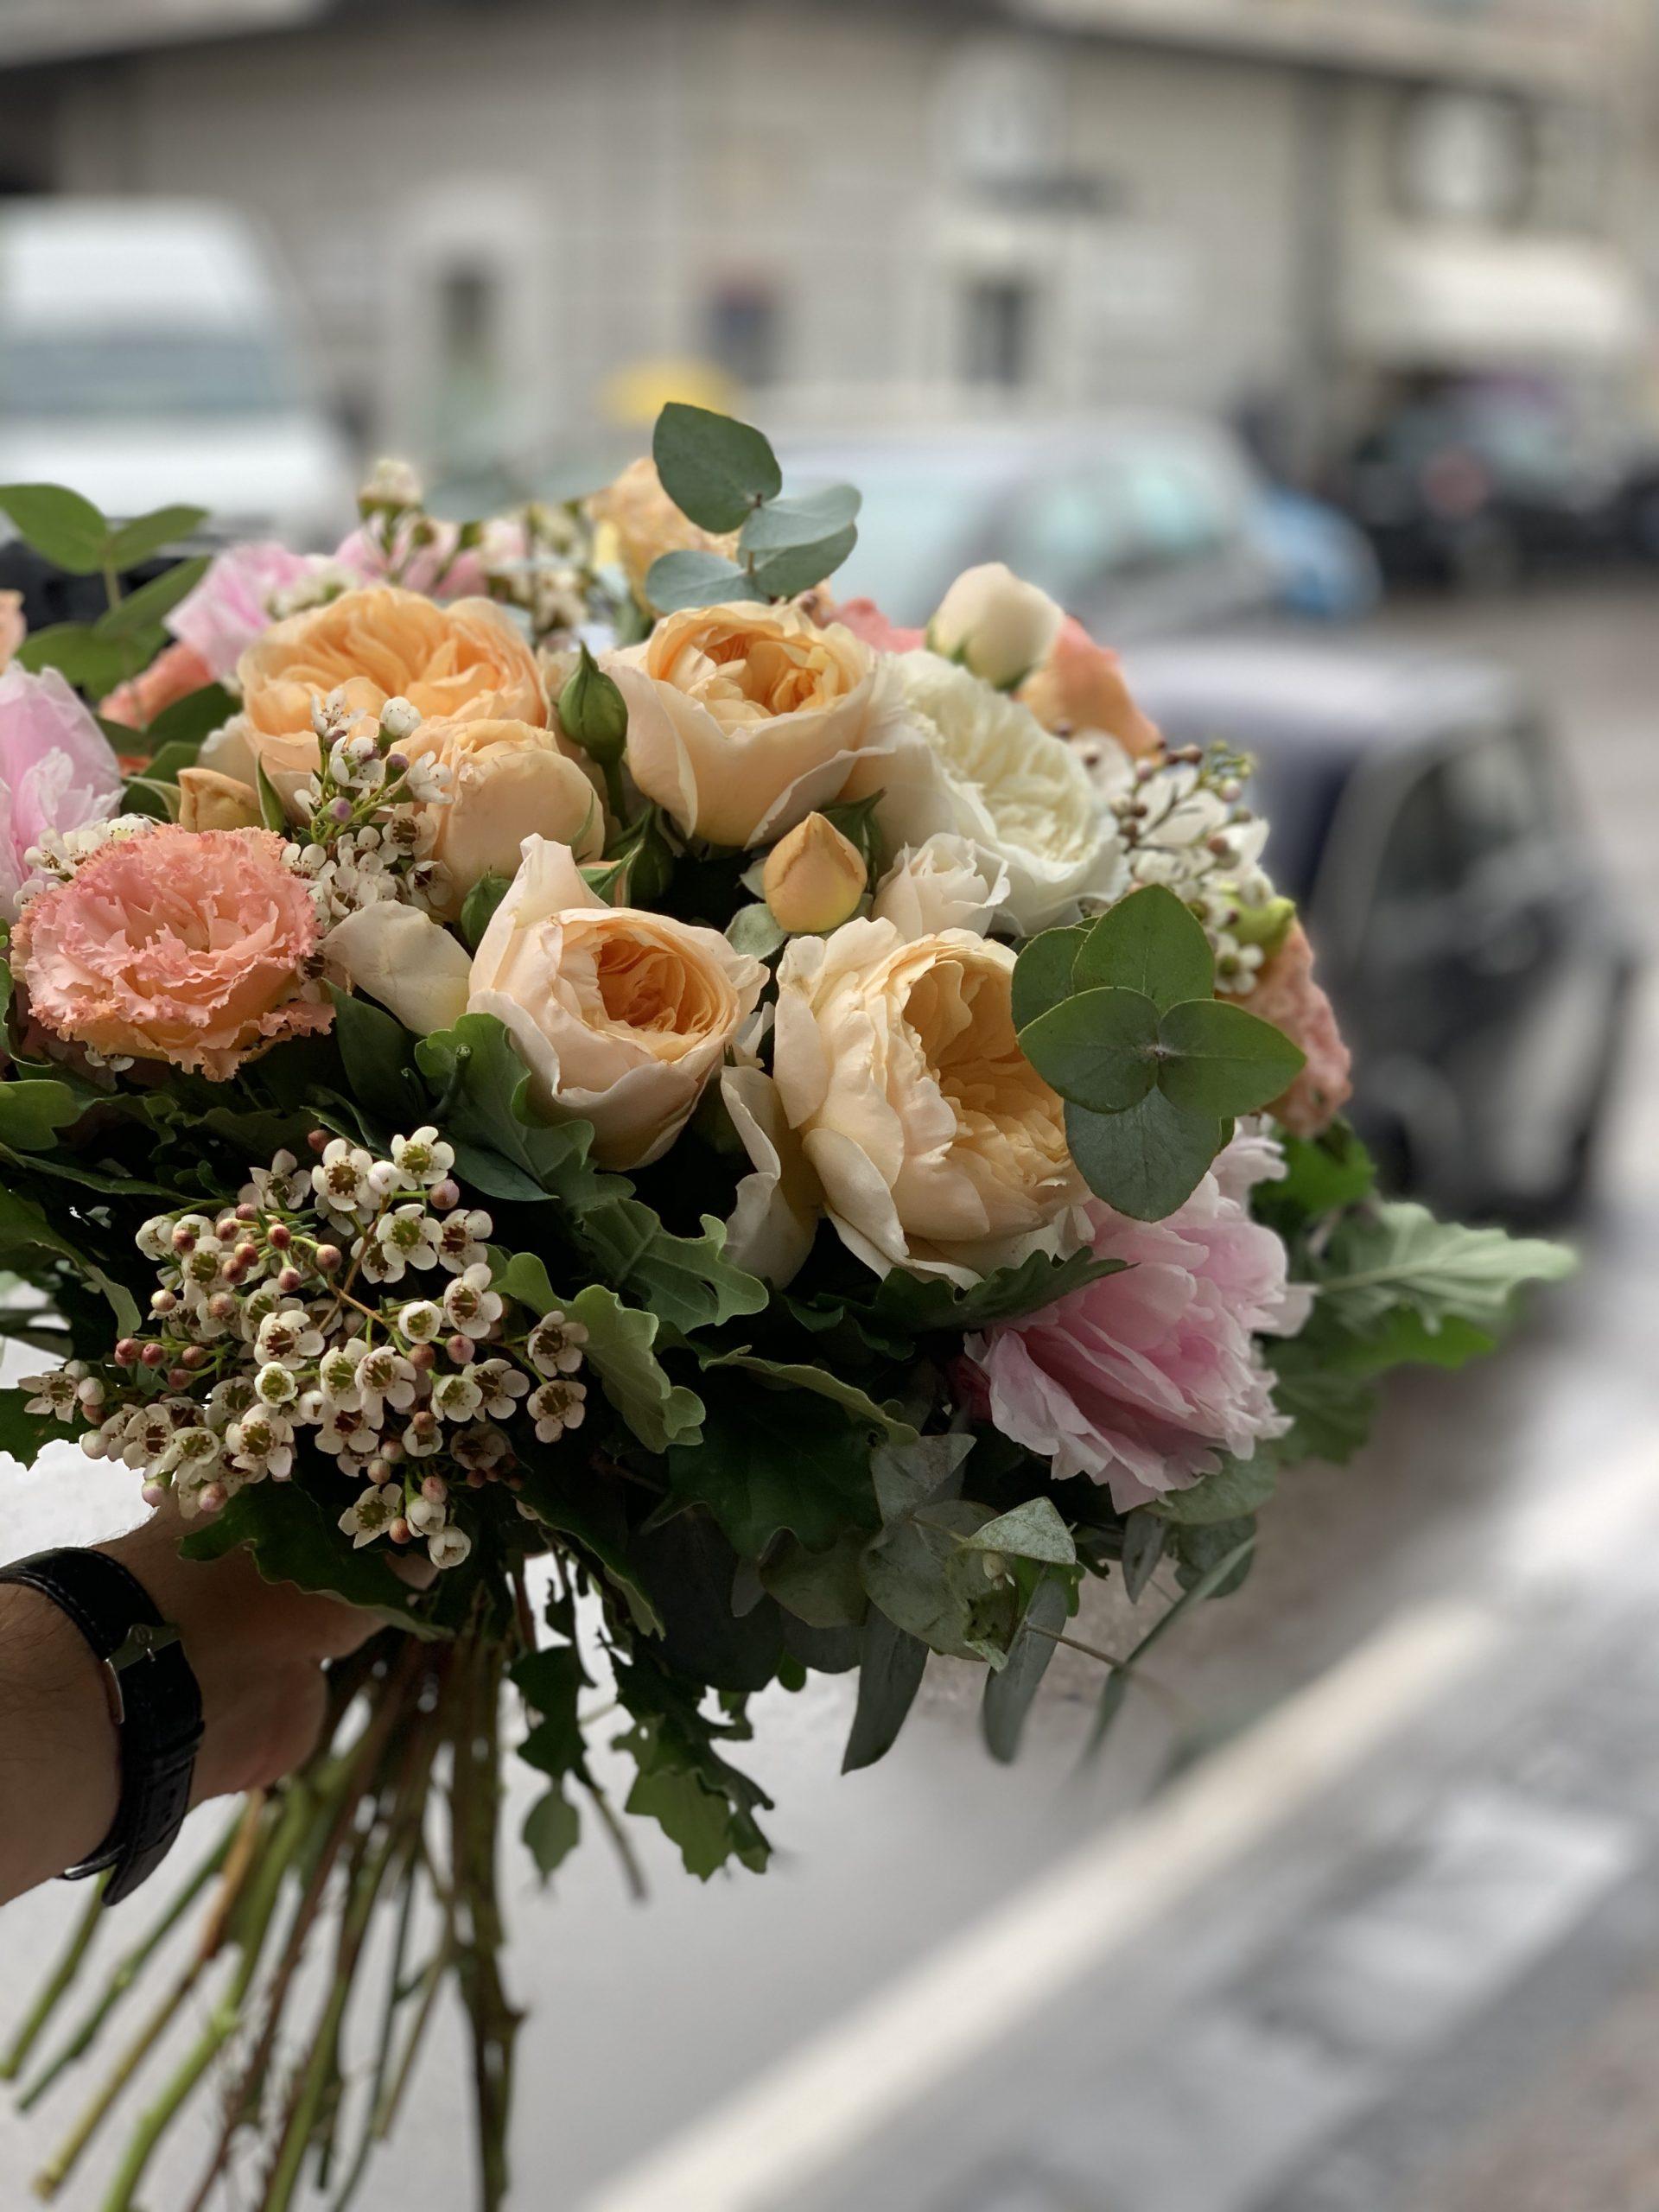 Bouquet Regalo Arancio 2 Garofalo Creazioni